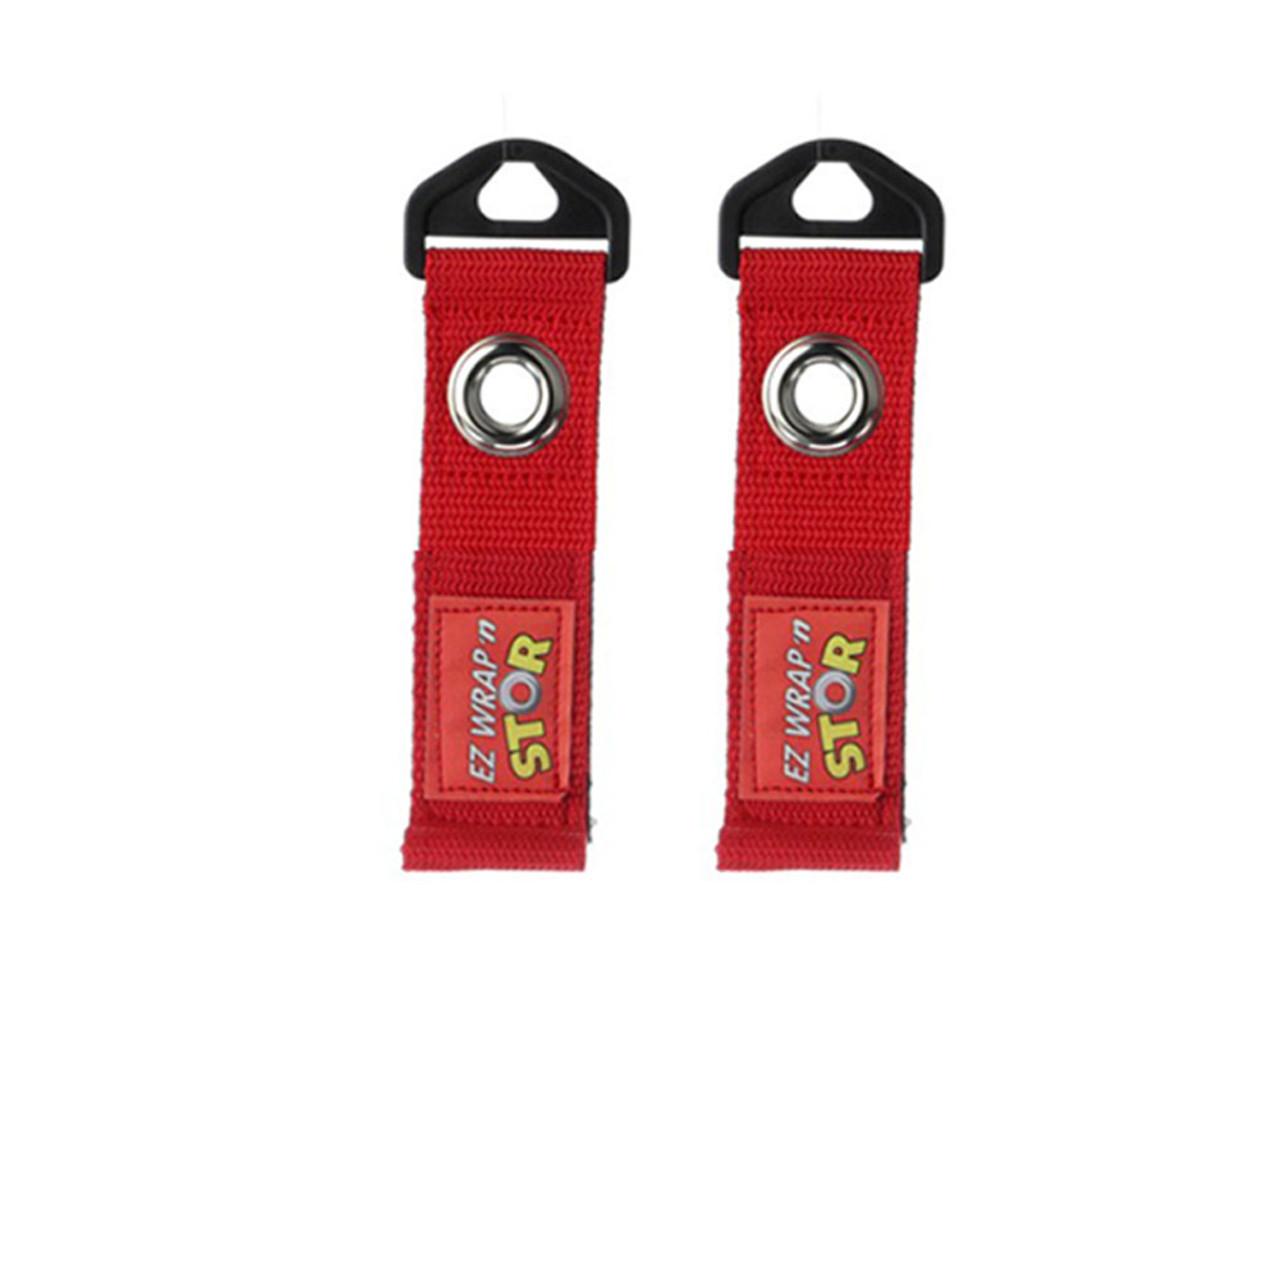 EZ Wrap 'n Stor™ Straps - Short / Velcro Straps - Bundling Straps - Velcro Tie - Velcro Strap